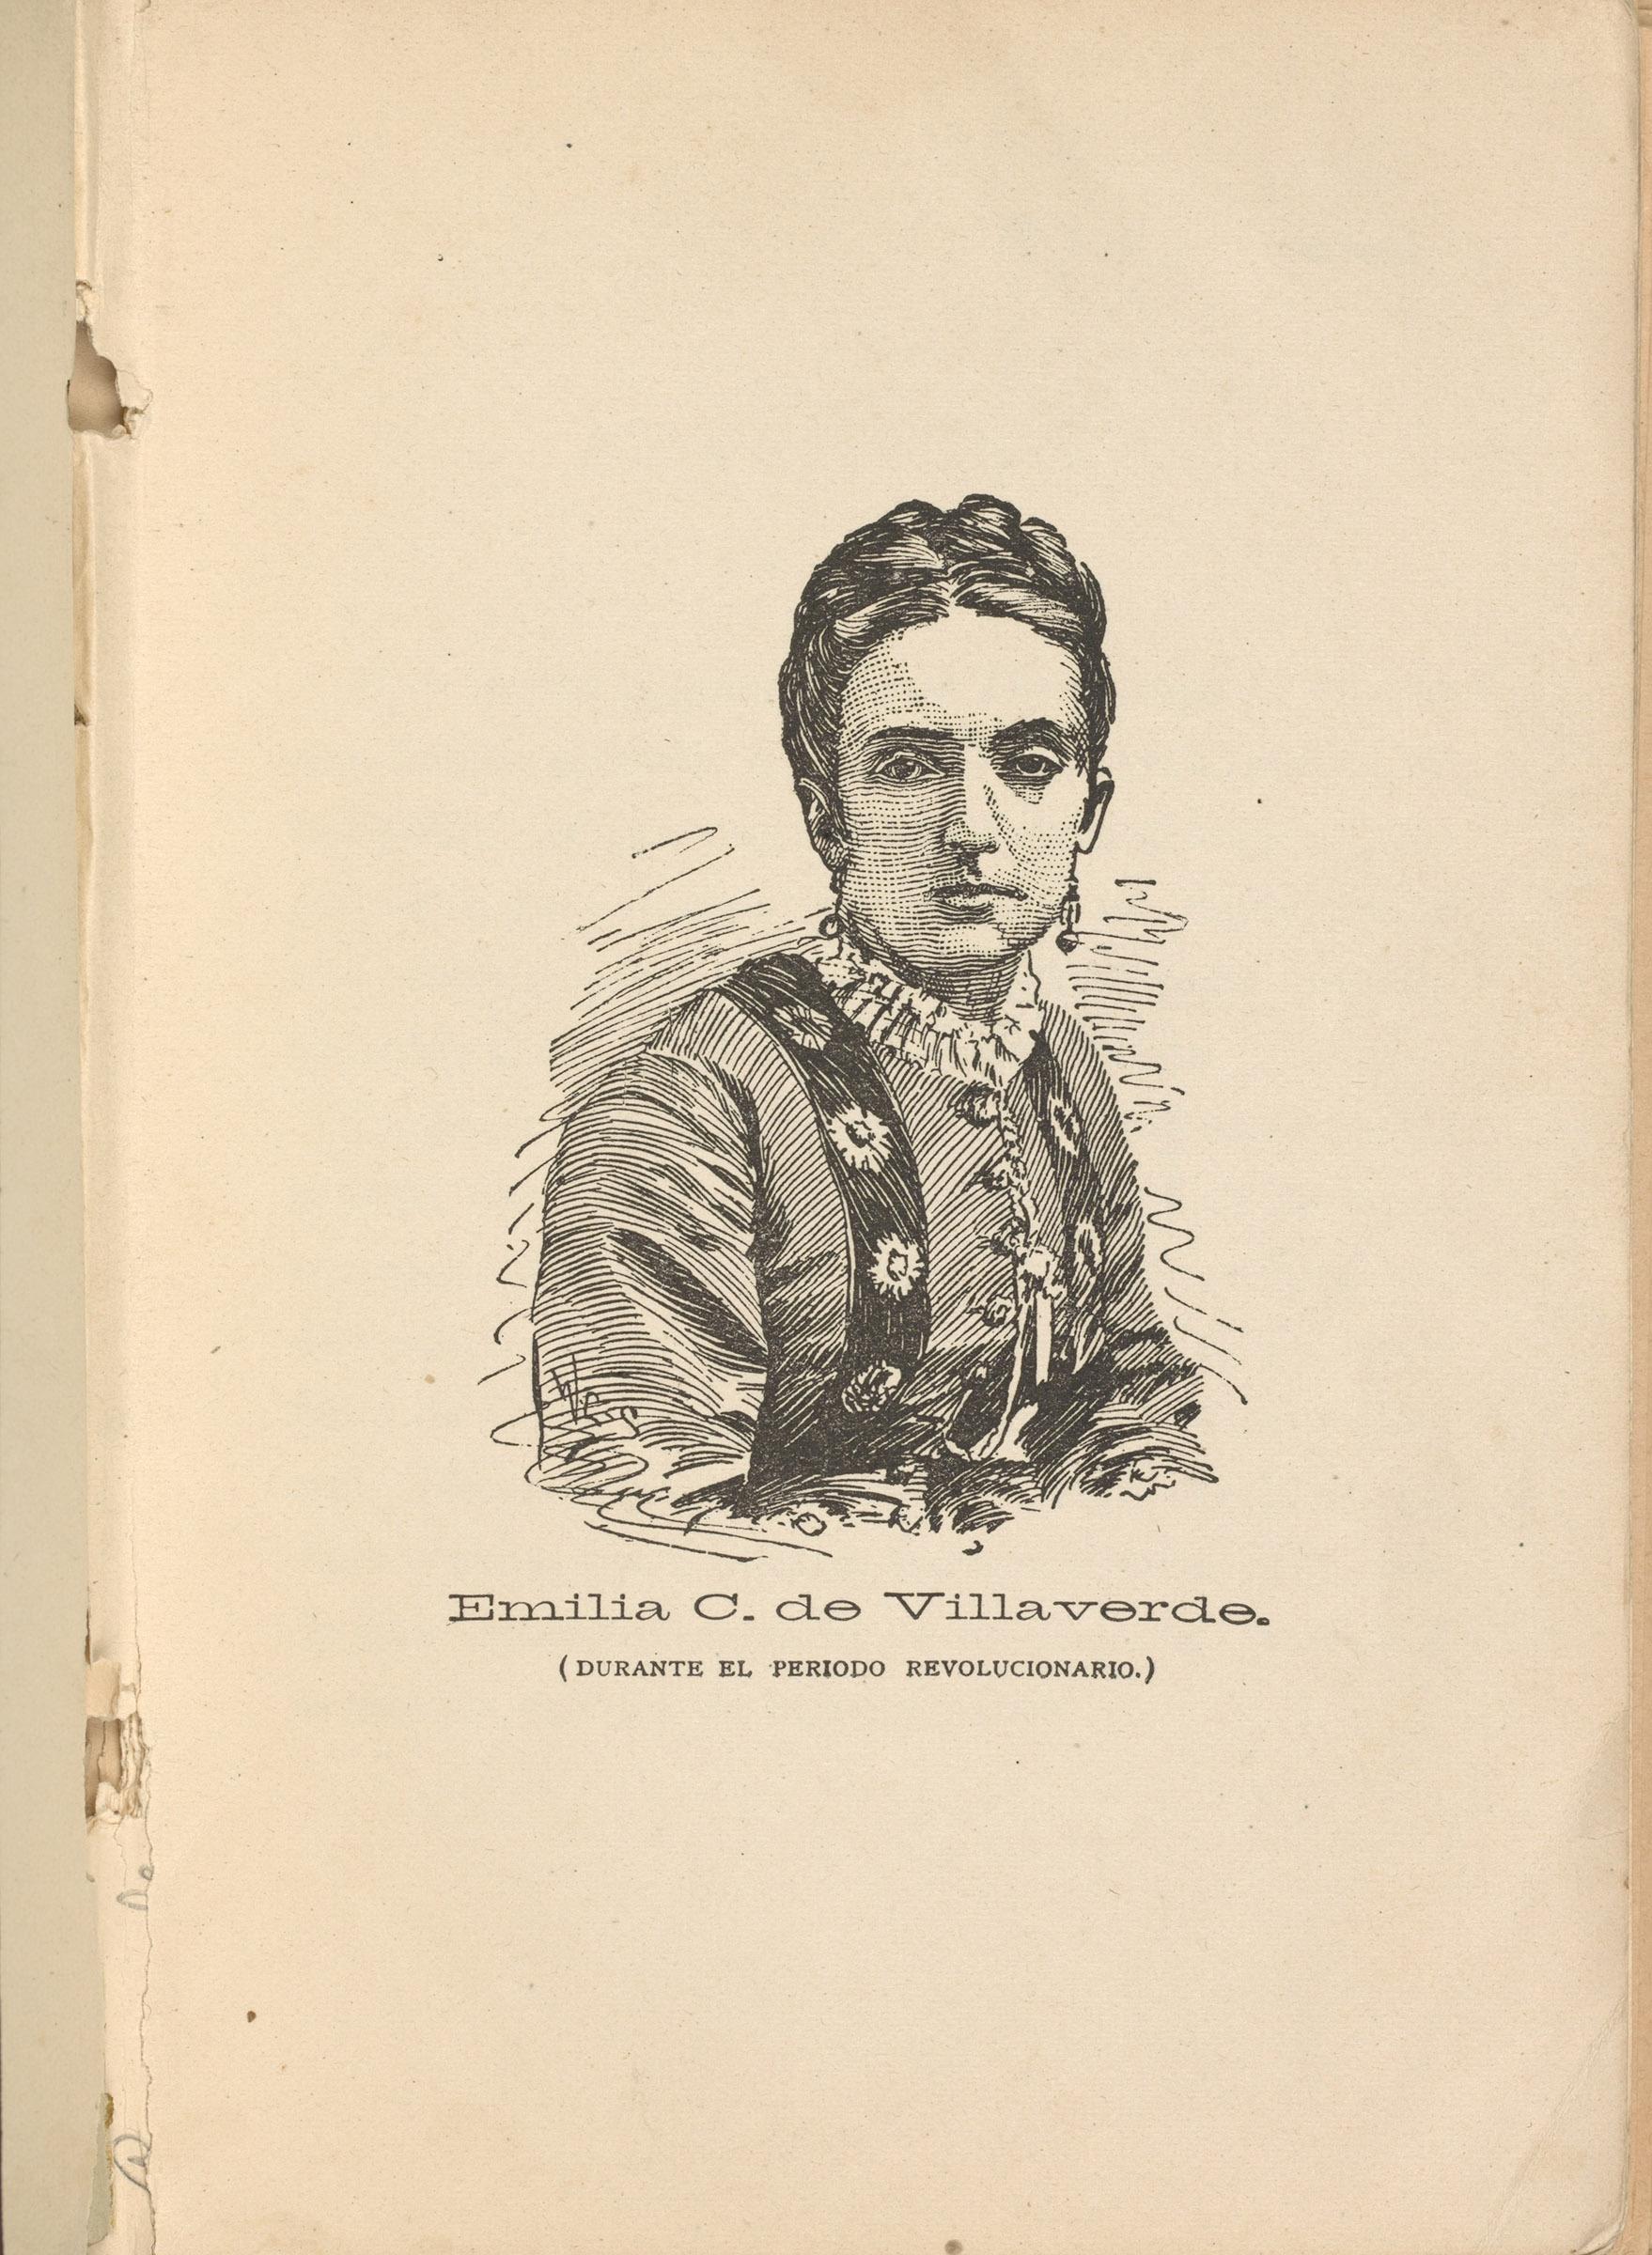 Portrait of Emilia Casanova de Villaverde, 1874.